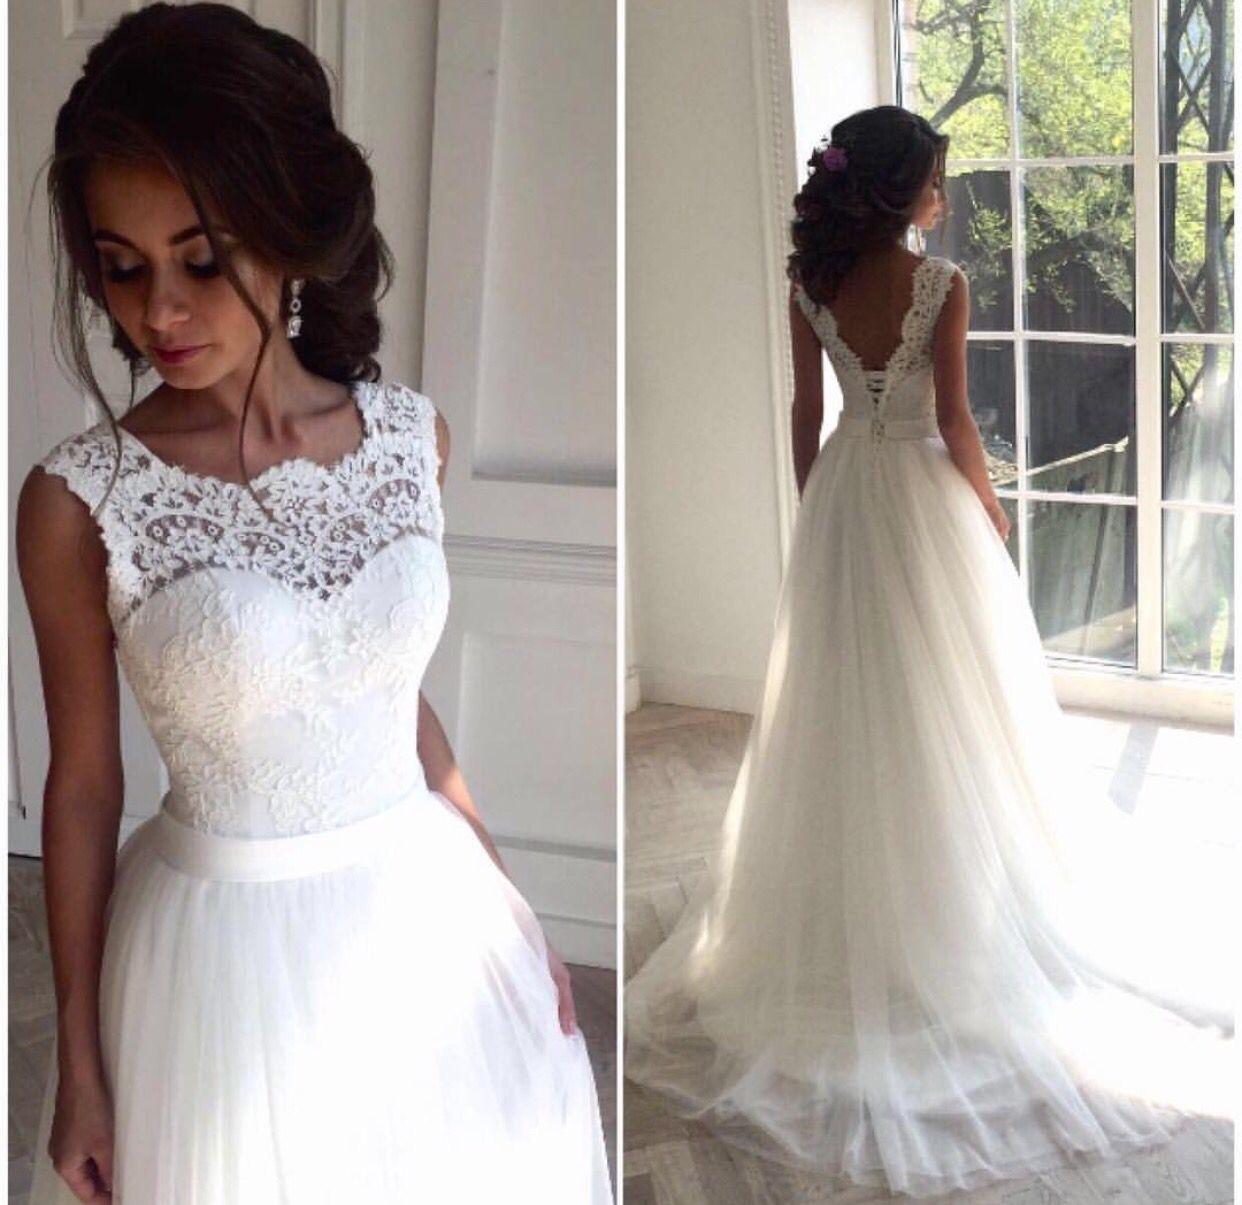 vestido1 | vestidos para eventos | Pinterest | Vestidos de novia, De ...